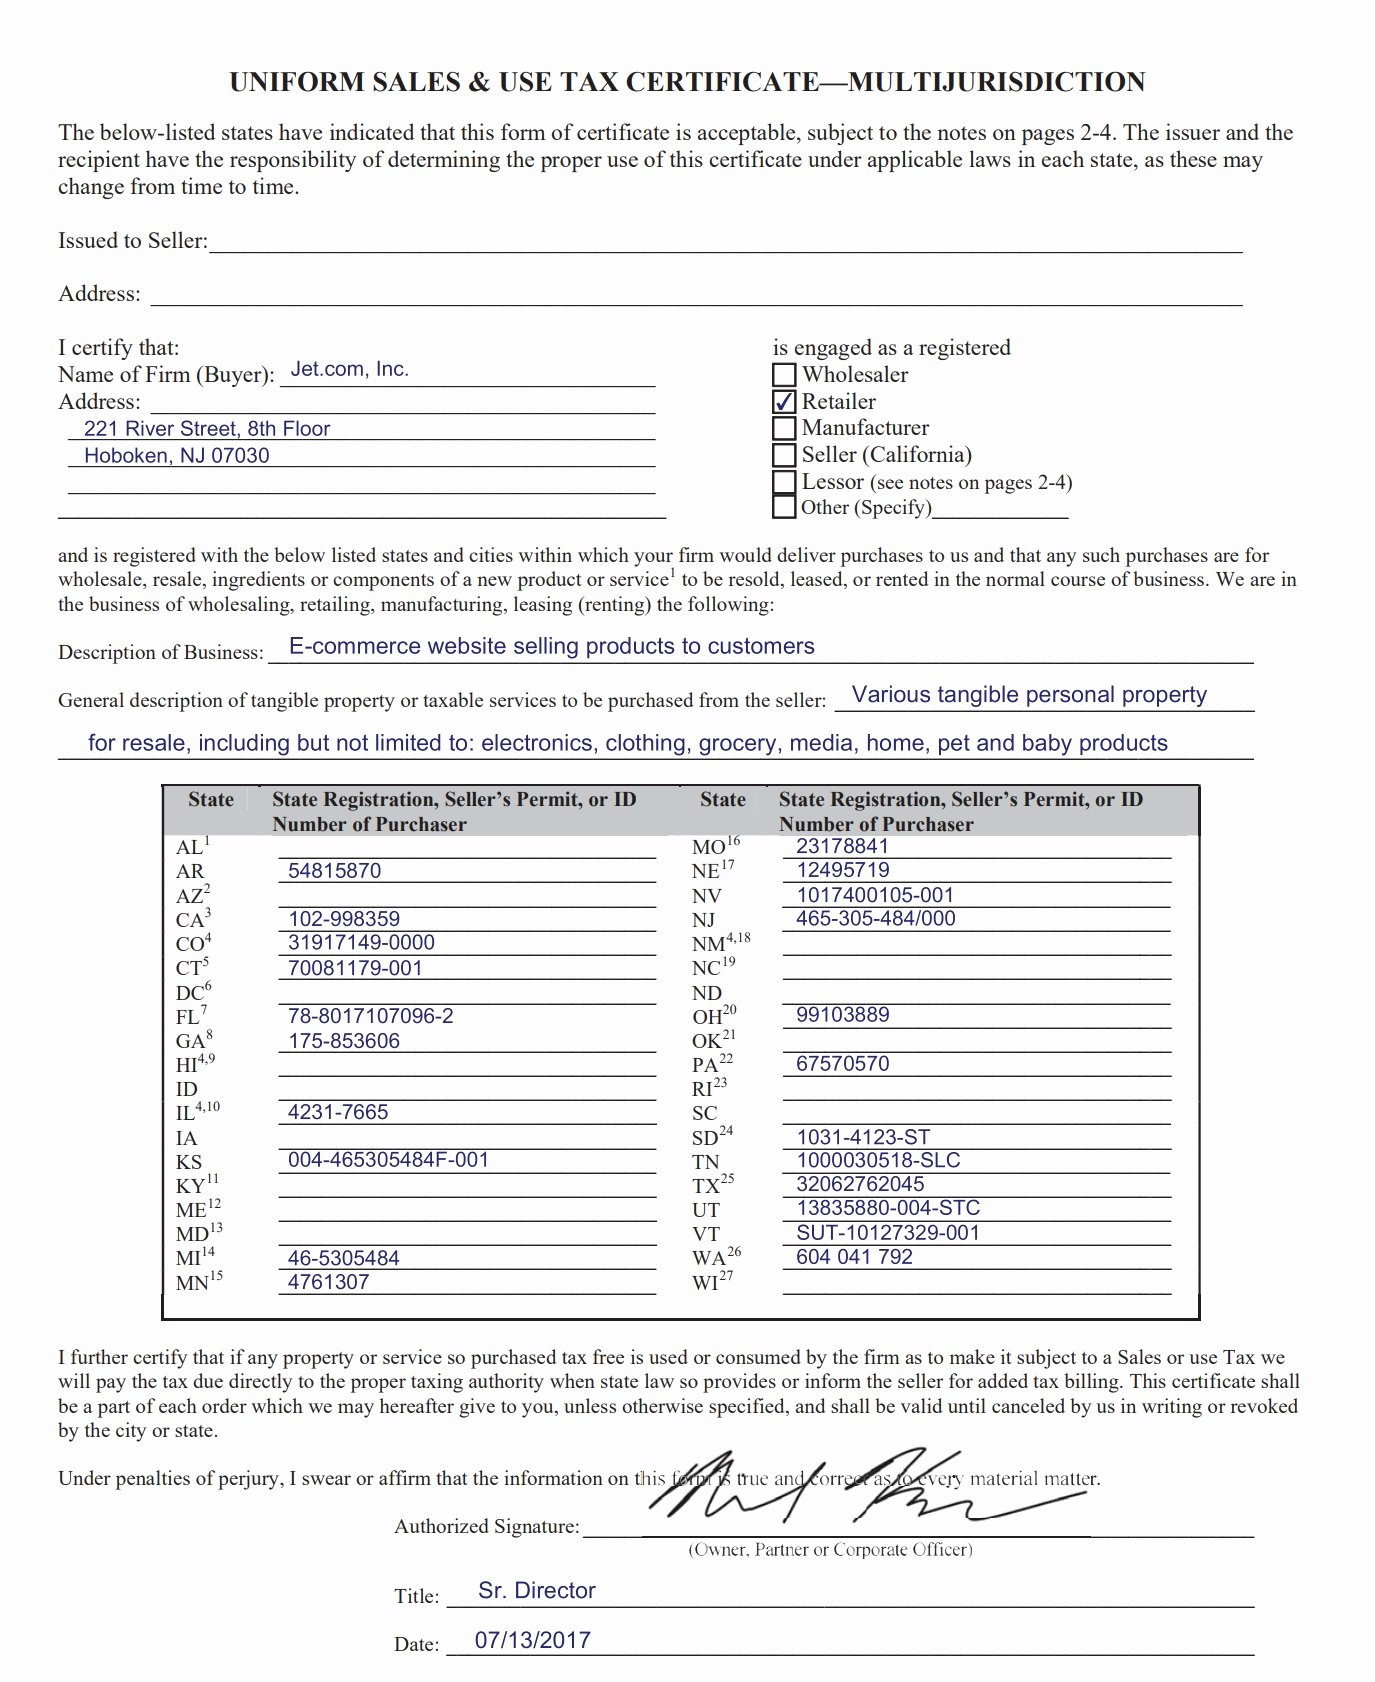 California Resale Certificate Template Beautiful 14 Special Uniform Sales and Use Tax Certificate